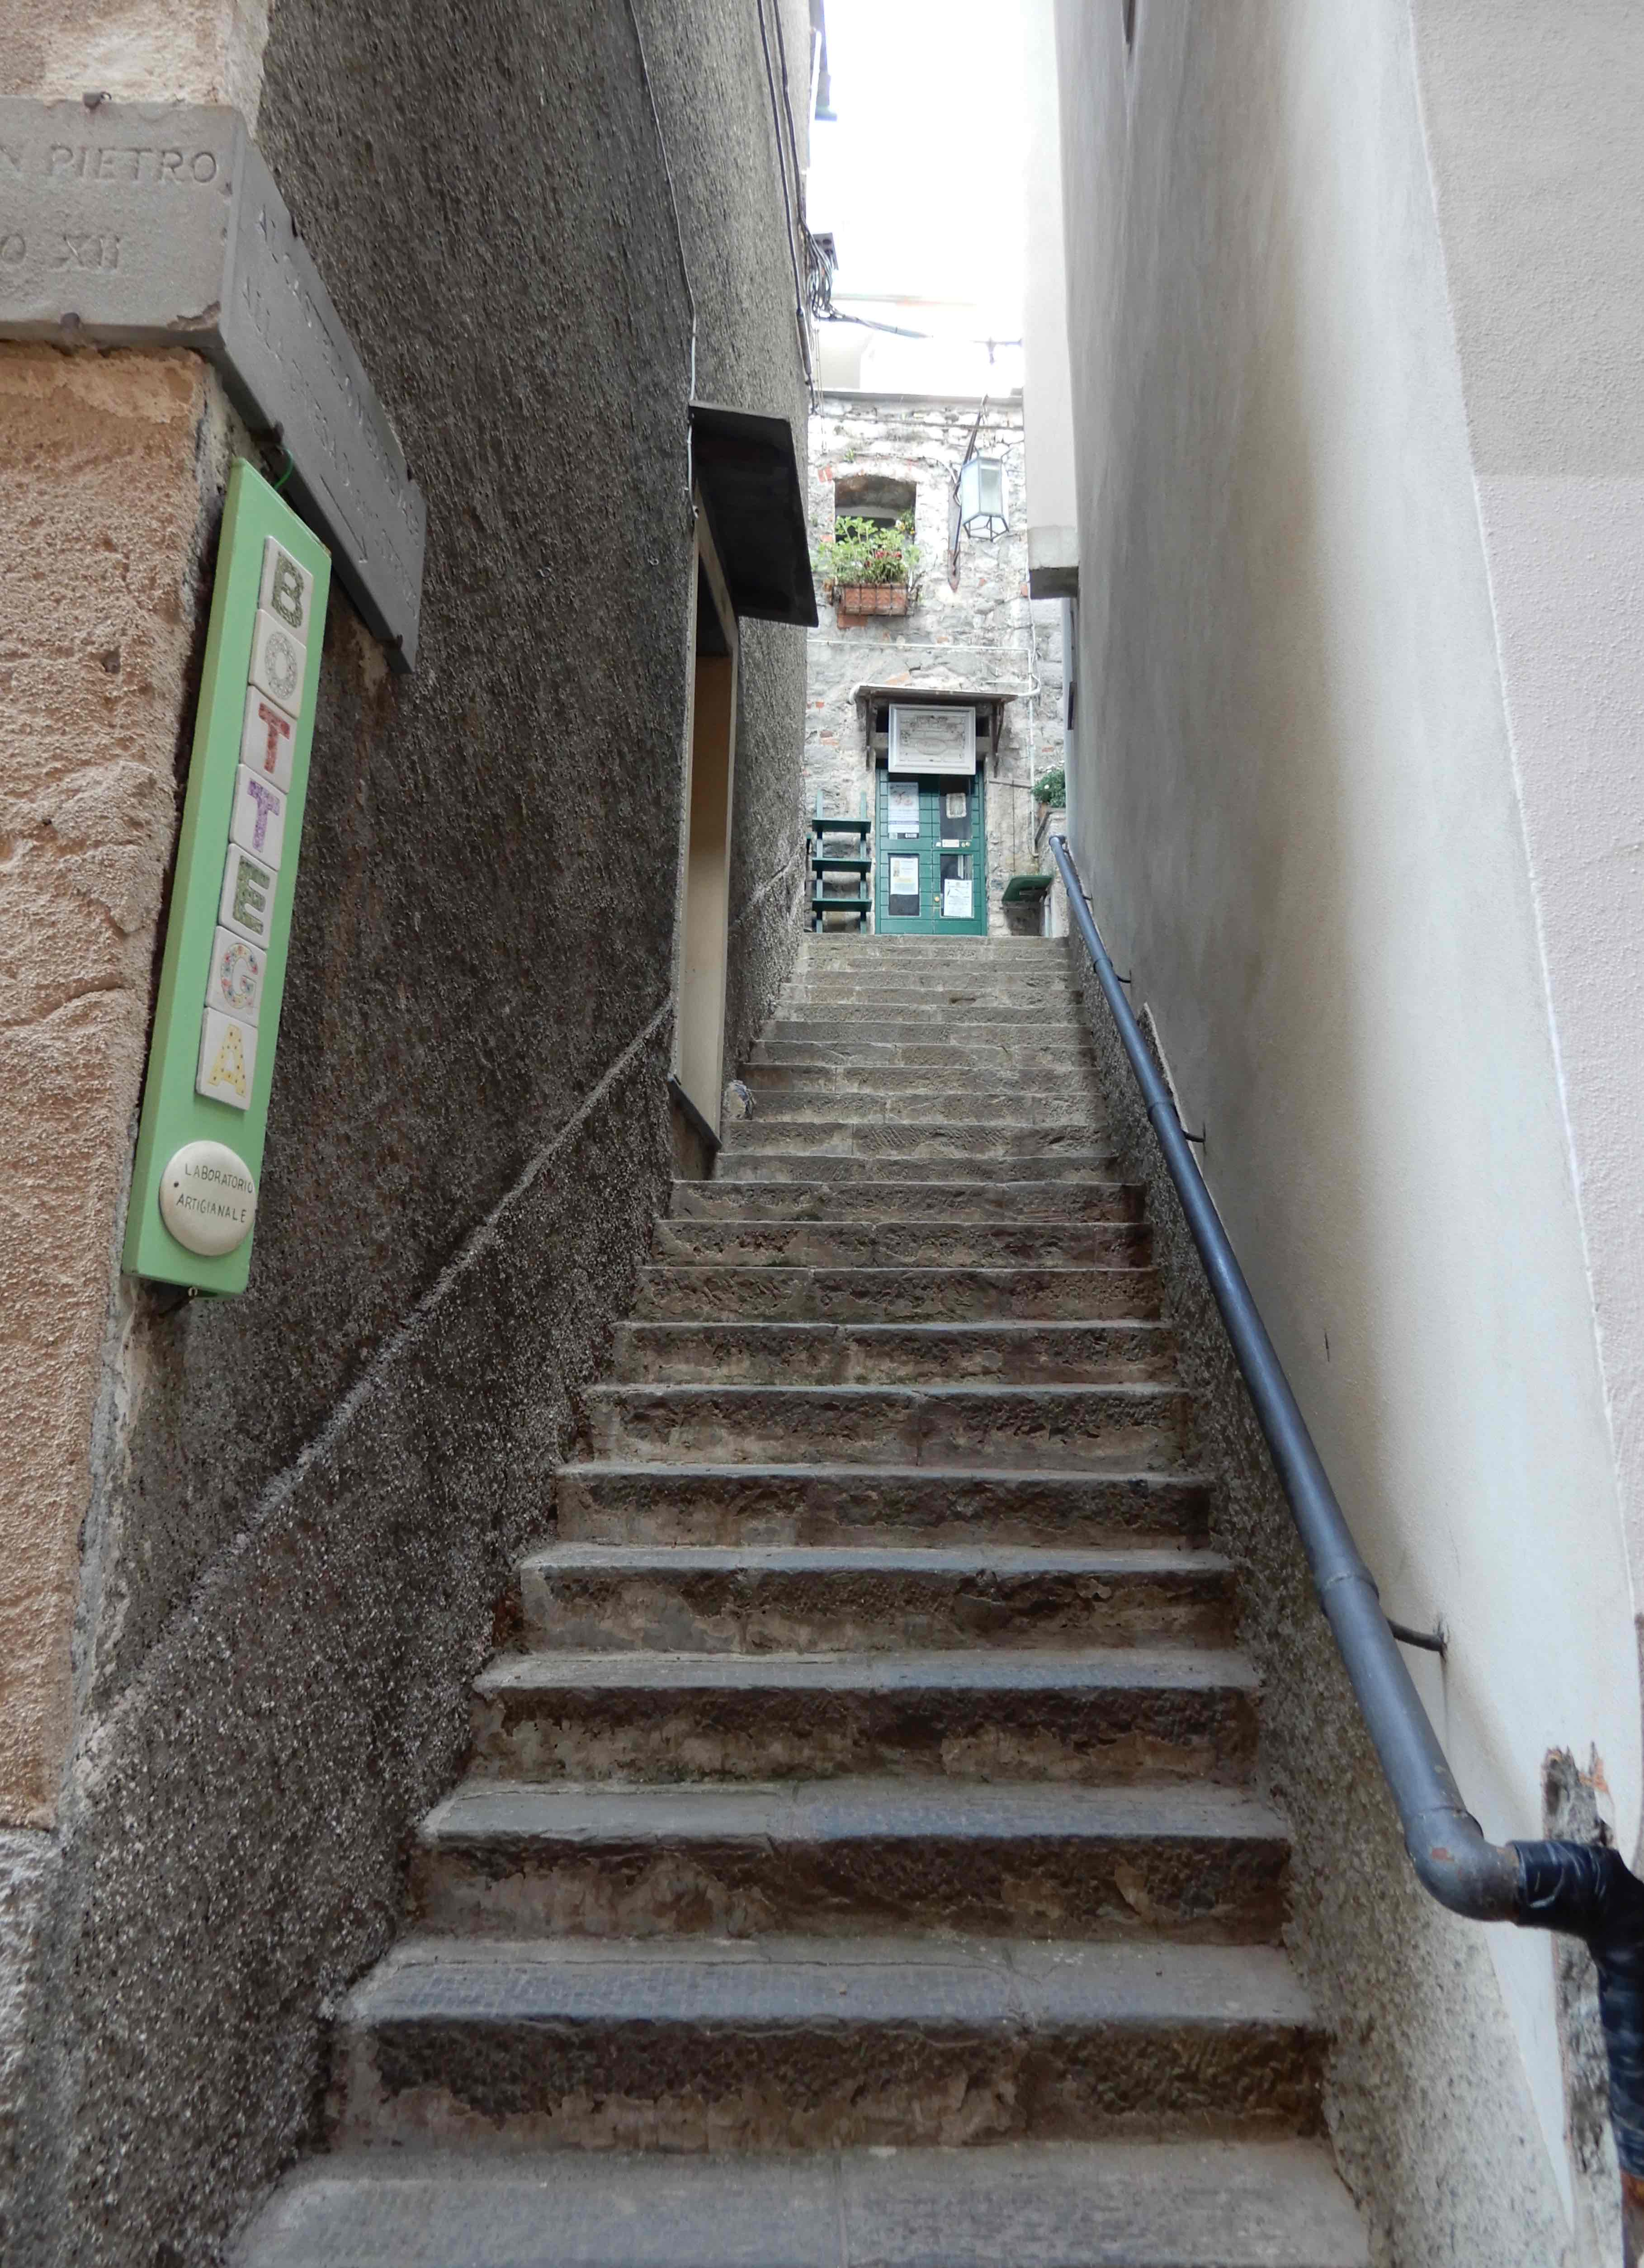 31.steps to Via Giovanni Capellini